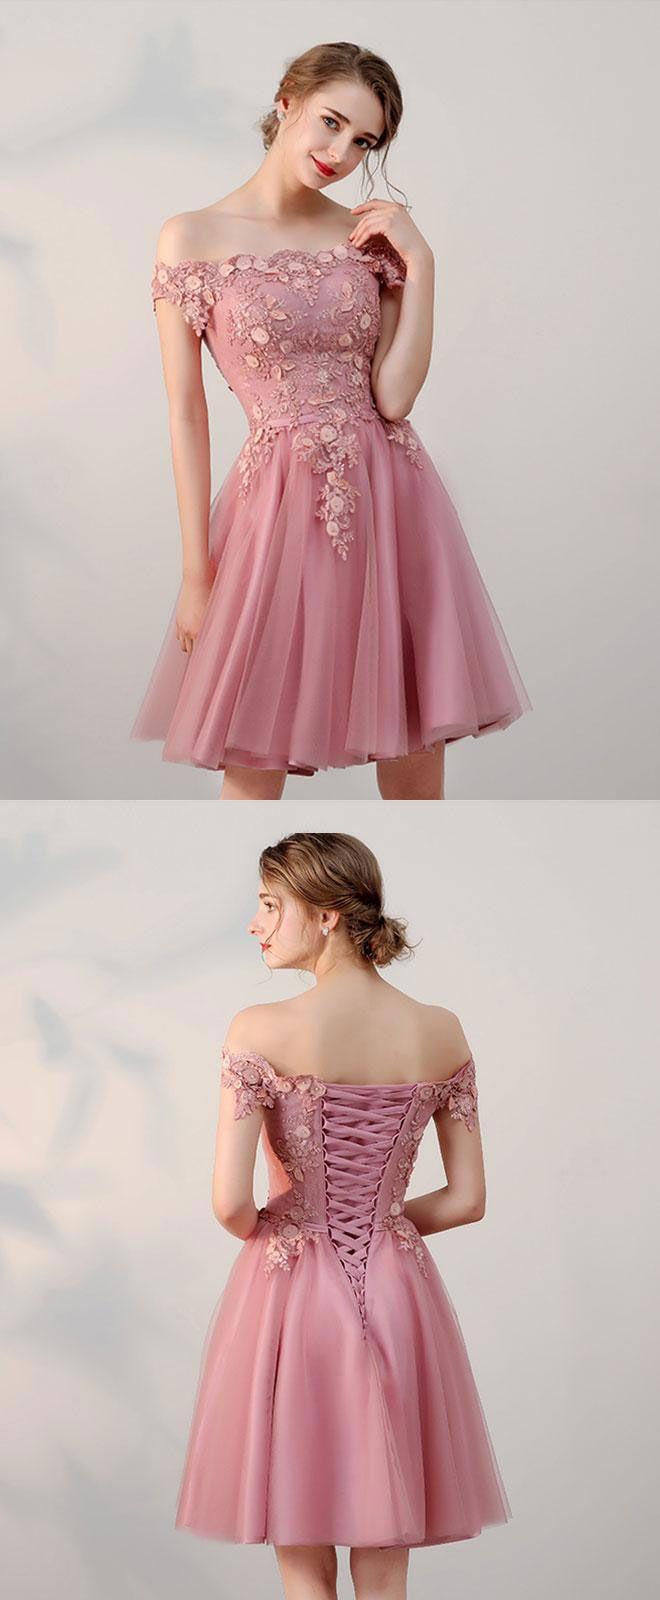 Pink lace tulle short prom dress pink evening dresses dresslove